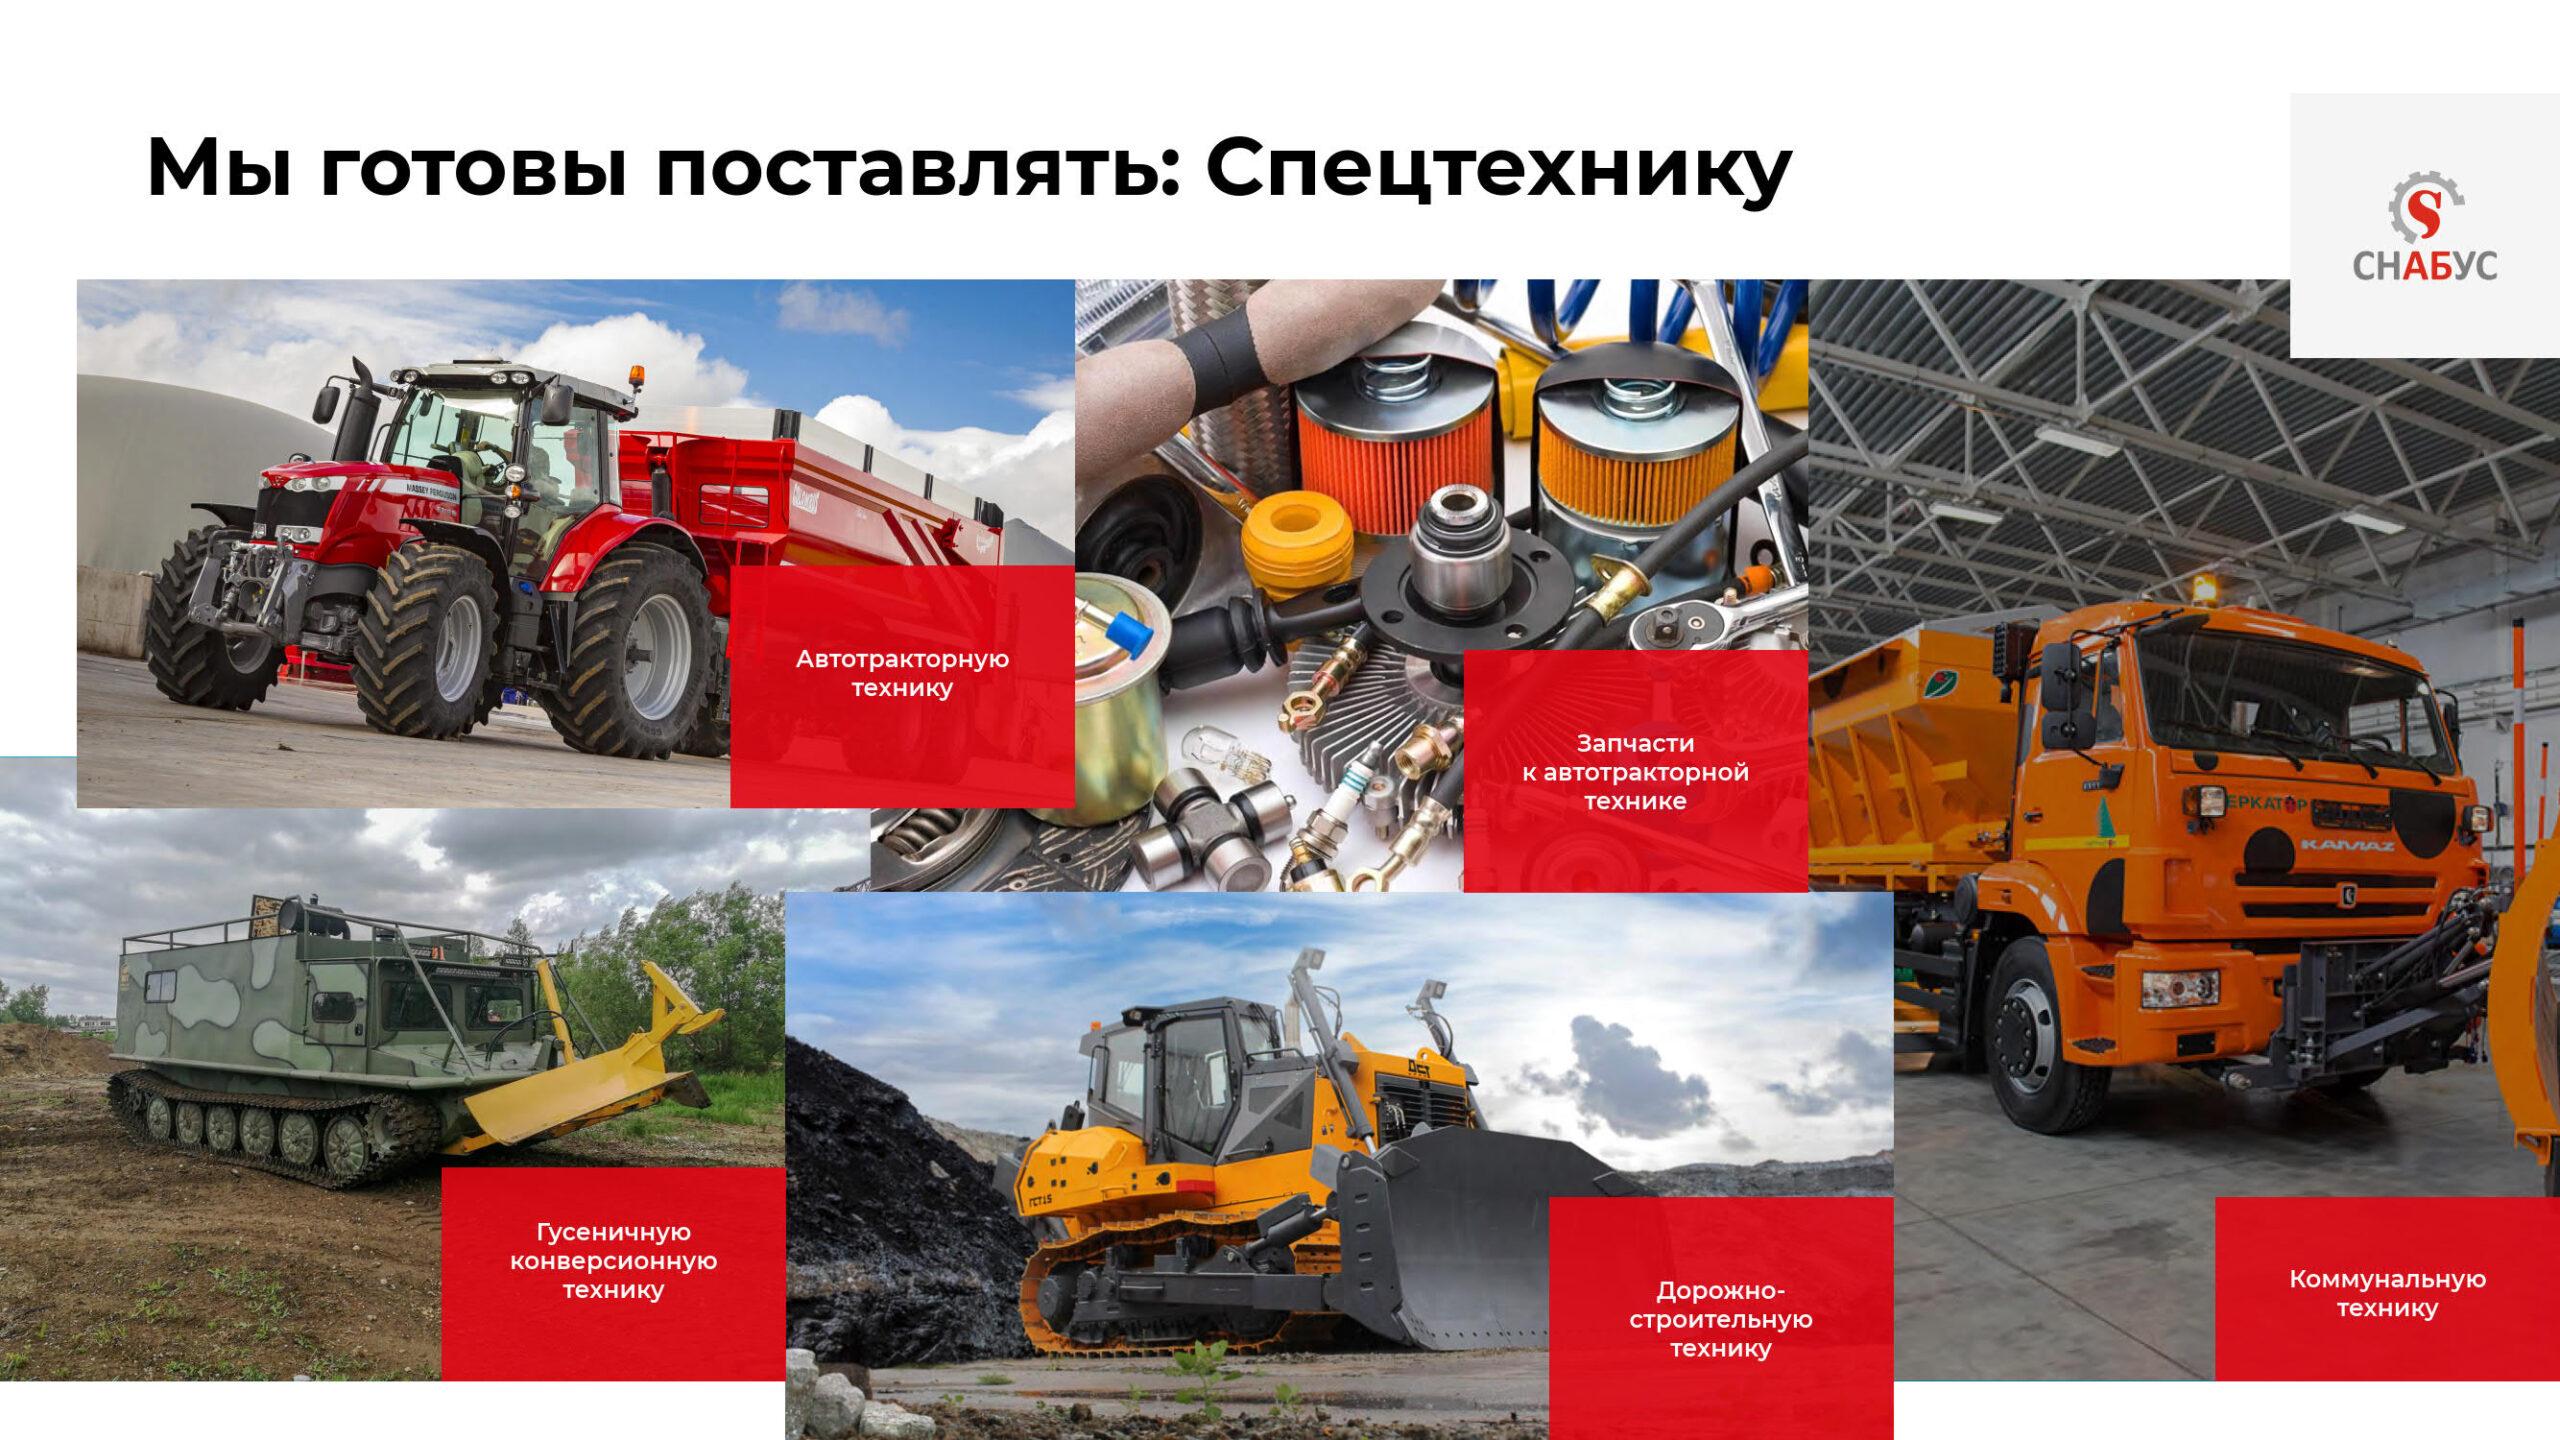 prezentacziya-optovoj-torgovoj-kompanii-postavka-spectehnika